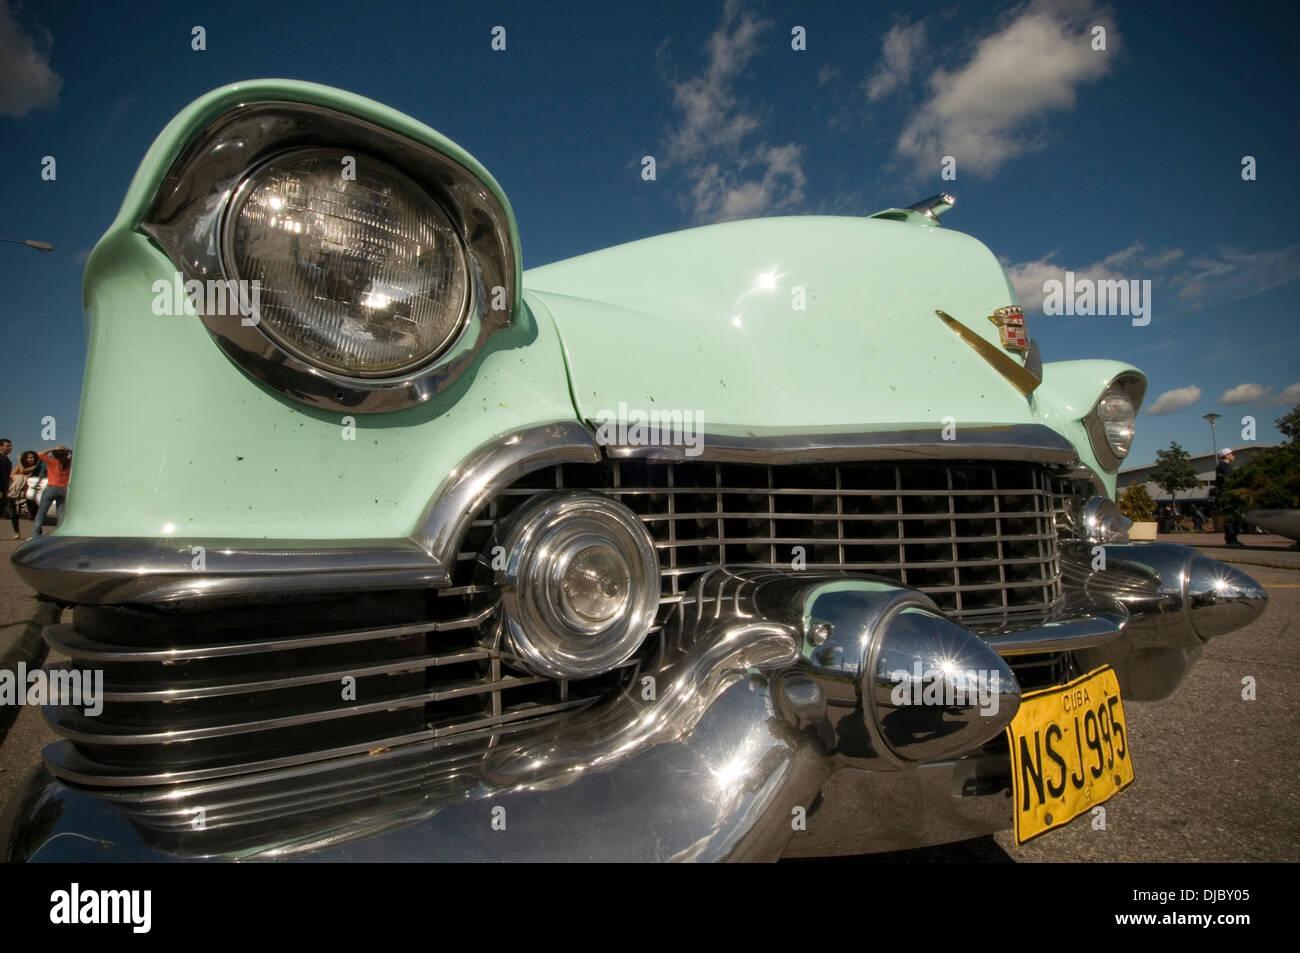 Cuba Cuban old car cars Cadillac American classic 1955 caddy number ...